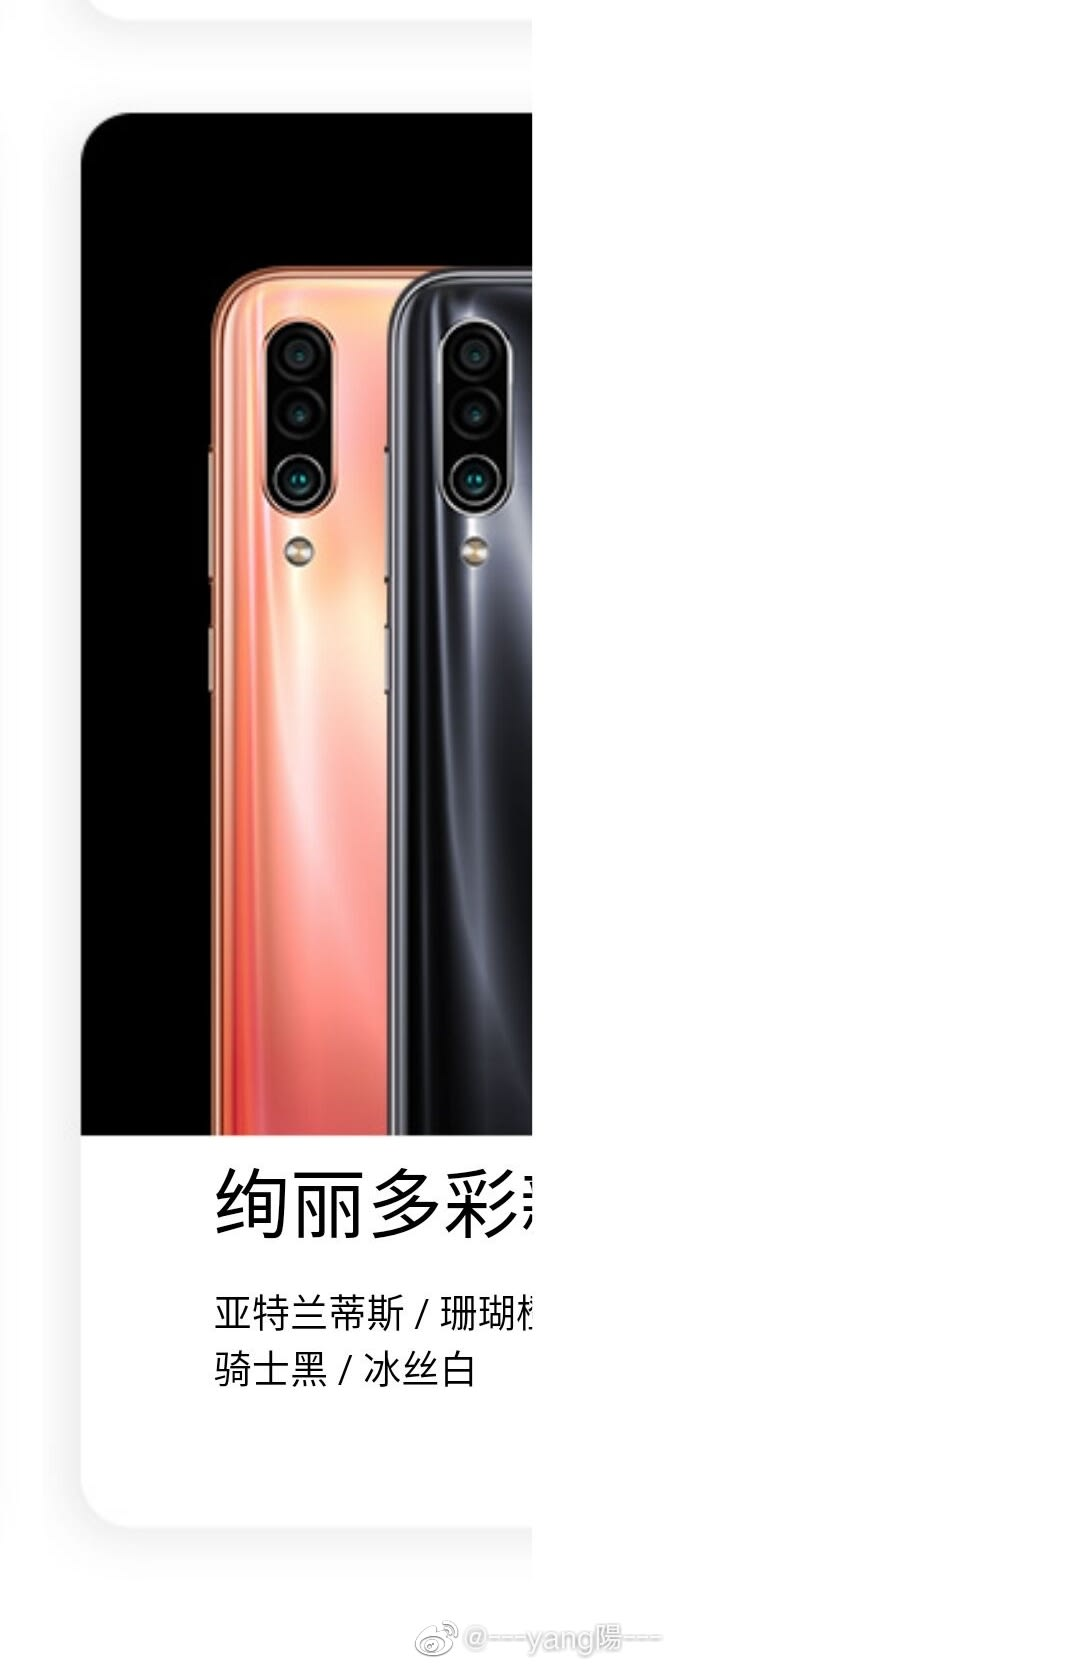 Huawei Nova 5i Key Specifications Leaked